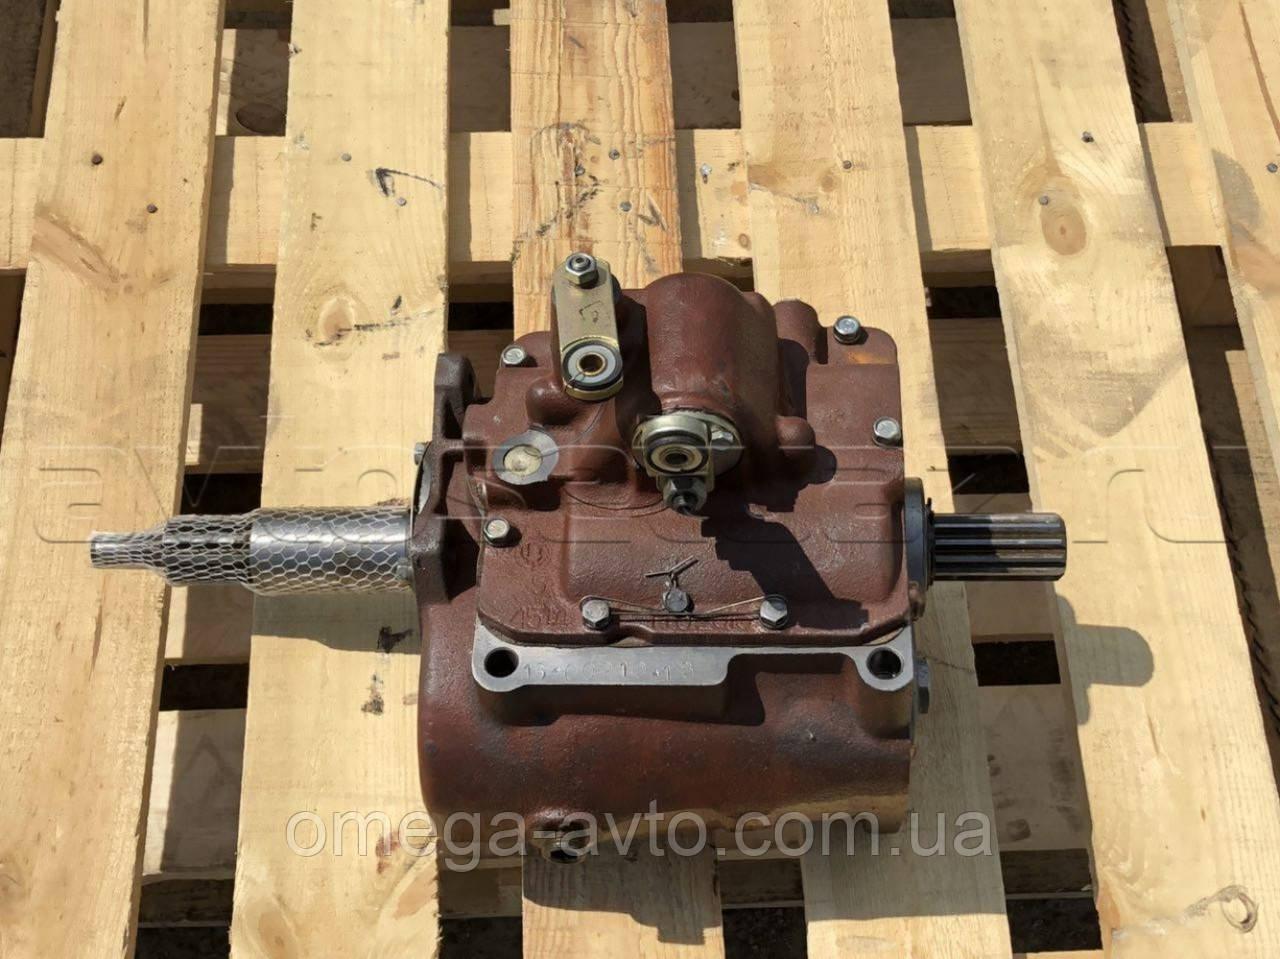 КПП УАЗ-452 ОРИГИНАЛ 452-1700010-11 (пр-во УАЗ)